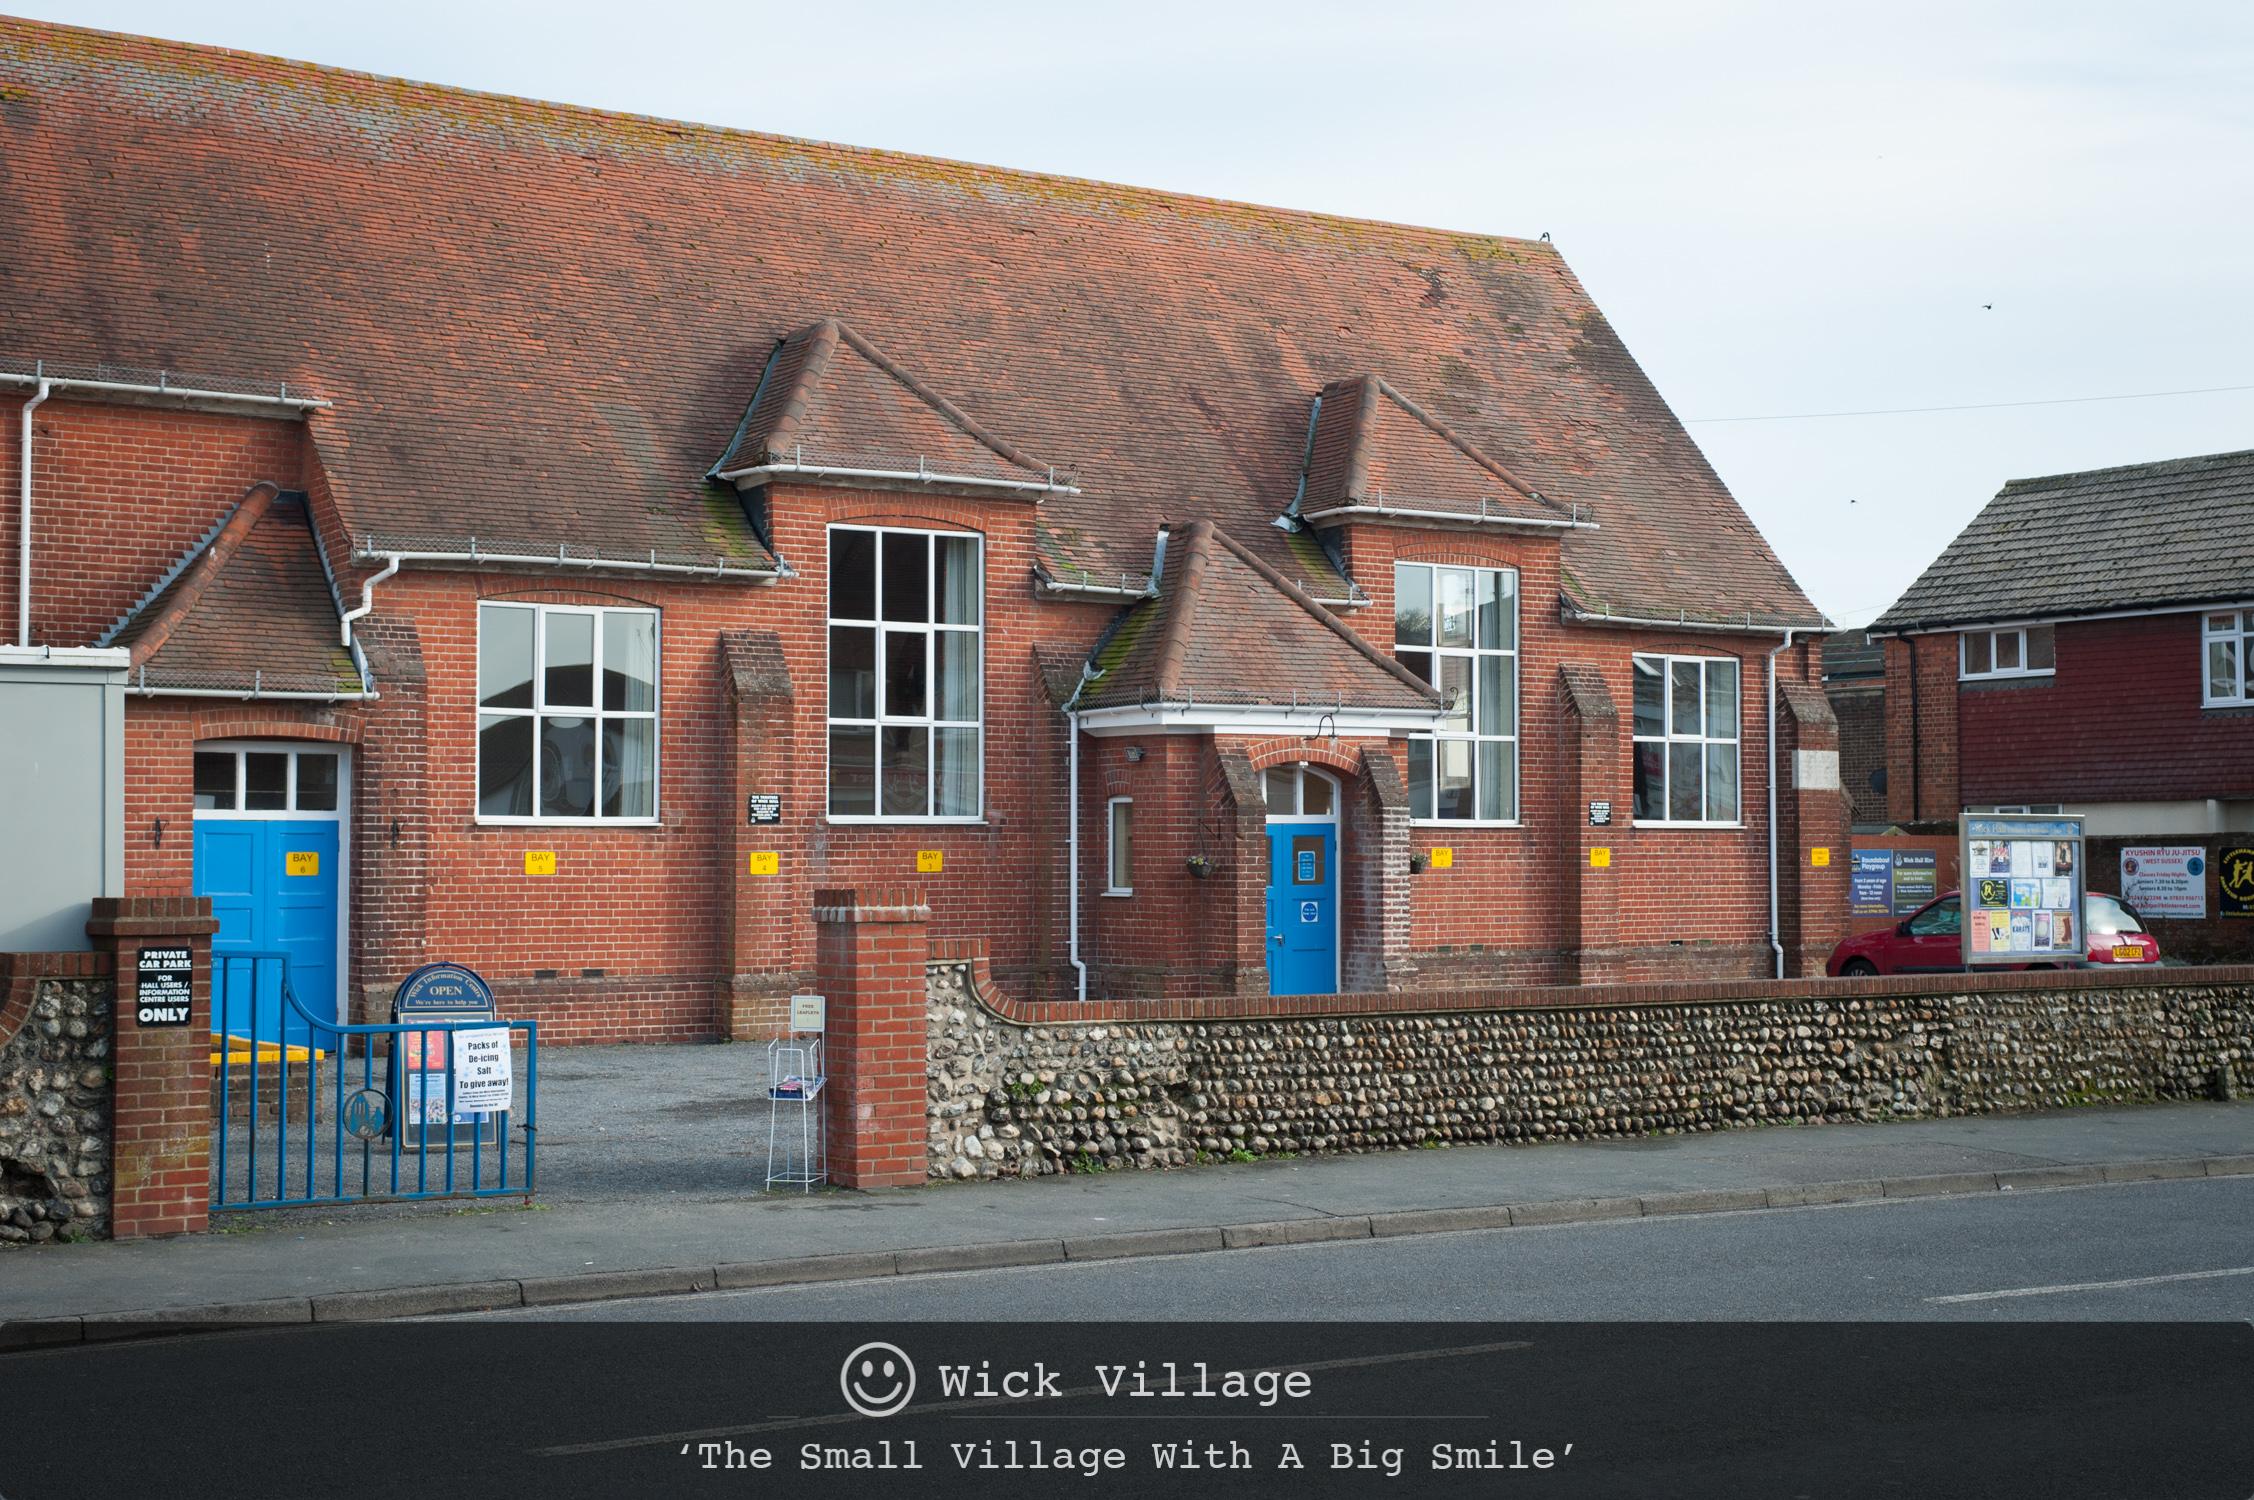 Wick Hall, Wick Village, Littlehampton.